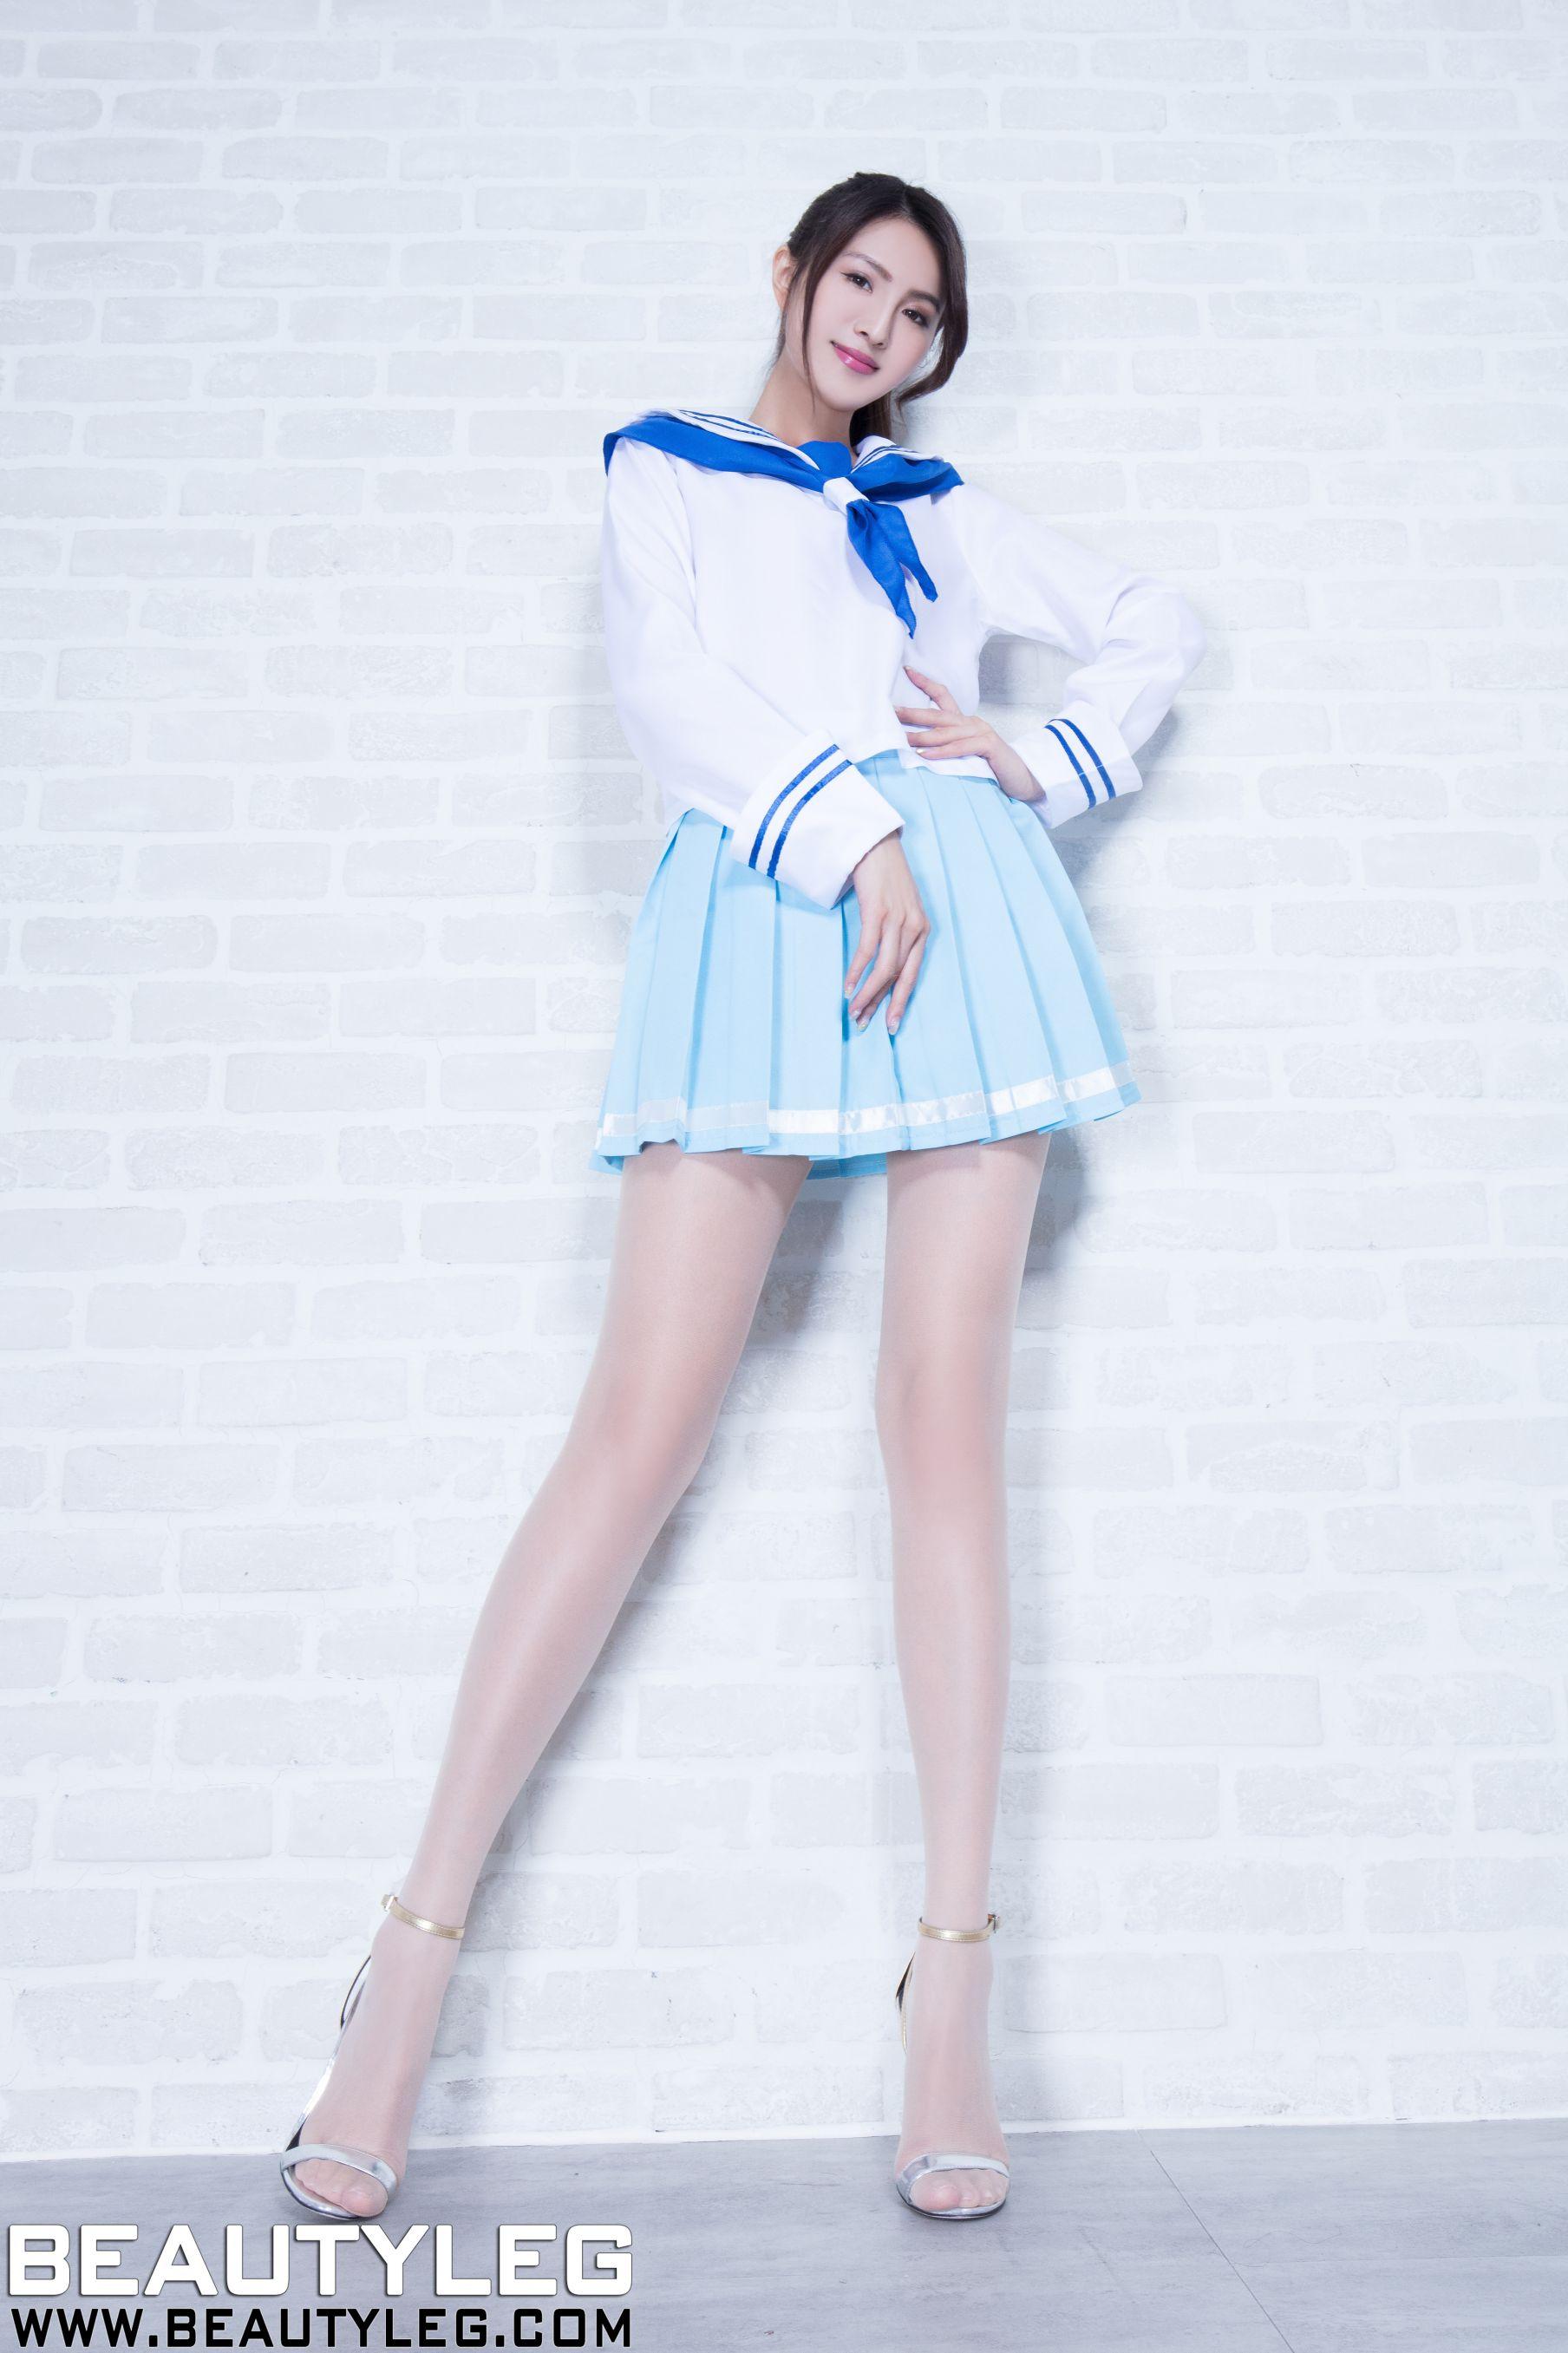 VOL.1121 [Beautyleg]长腿美女学生装:简晓育(腿模Vicni,晓育儿)高品质写真套图(48P)